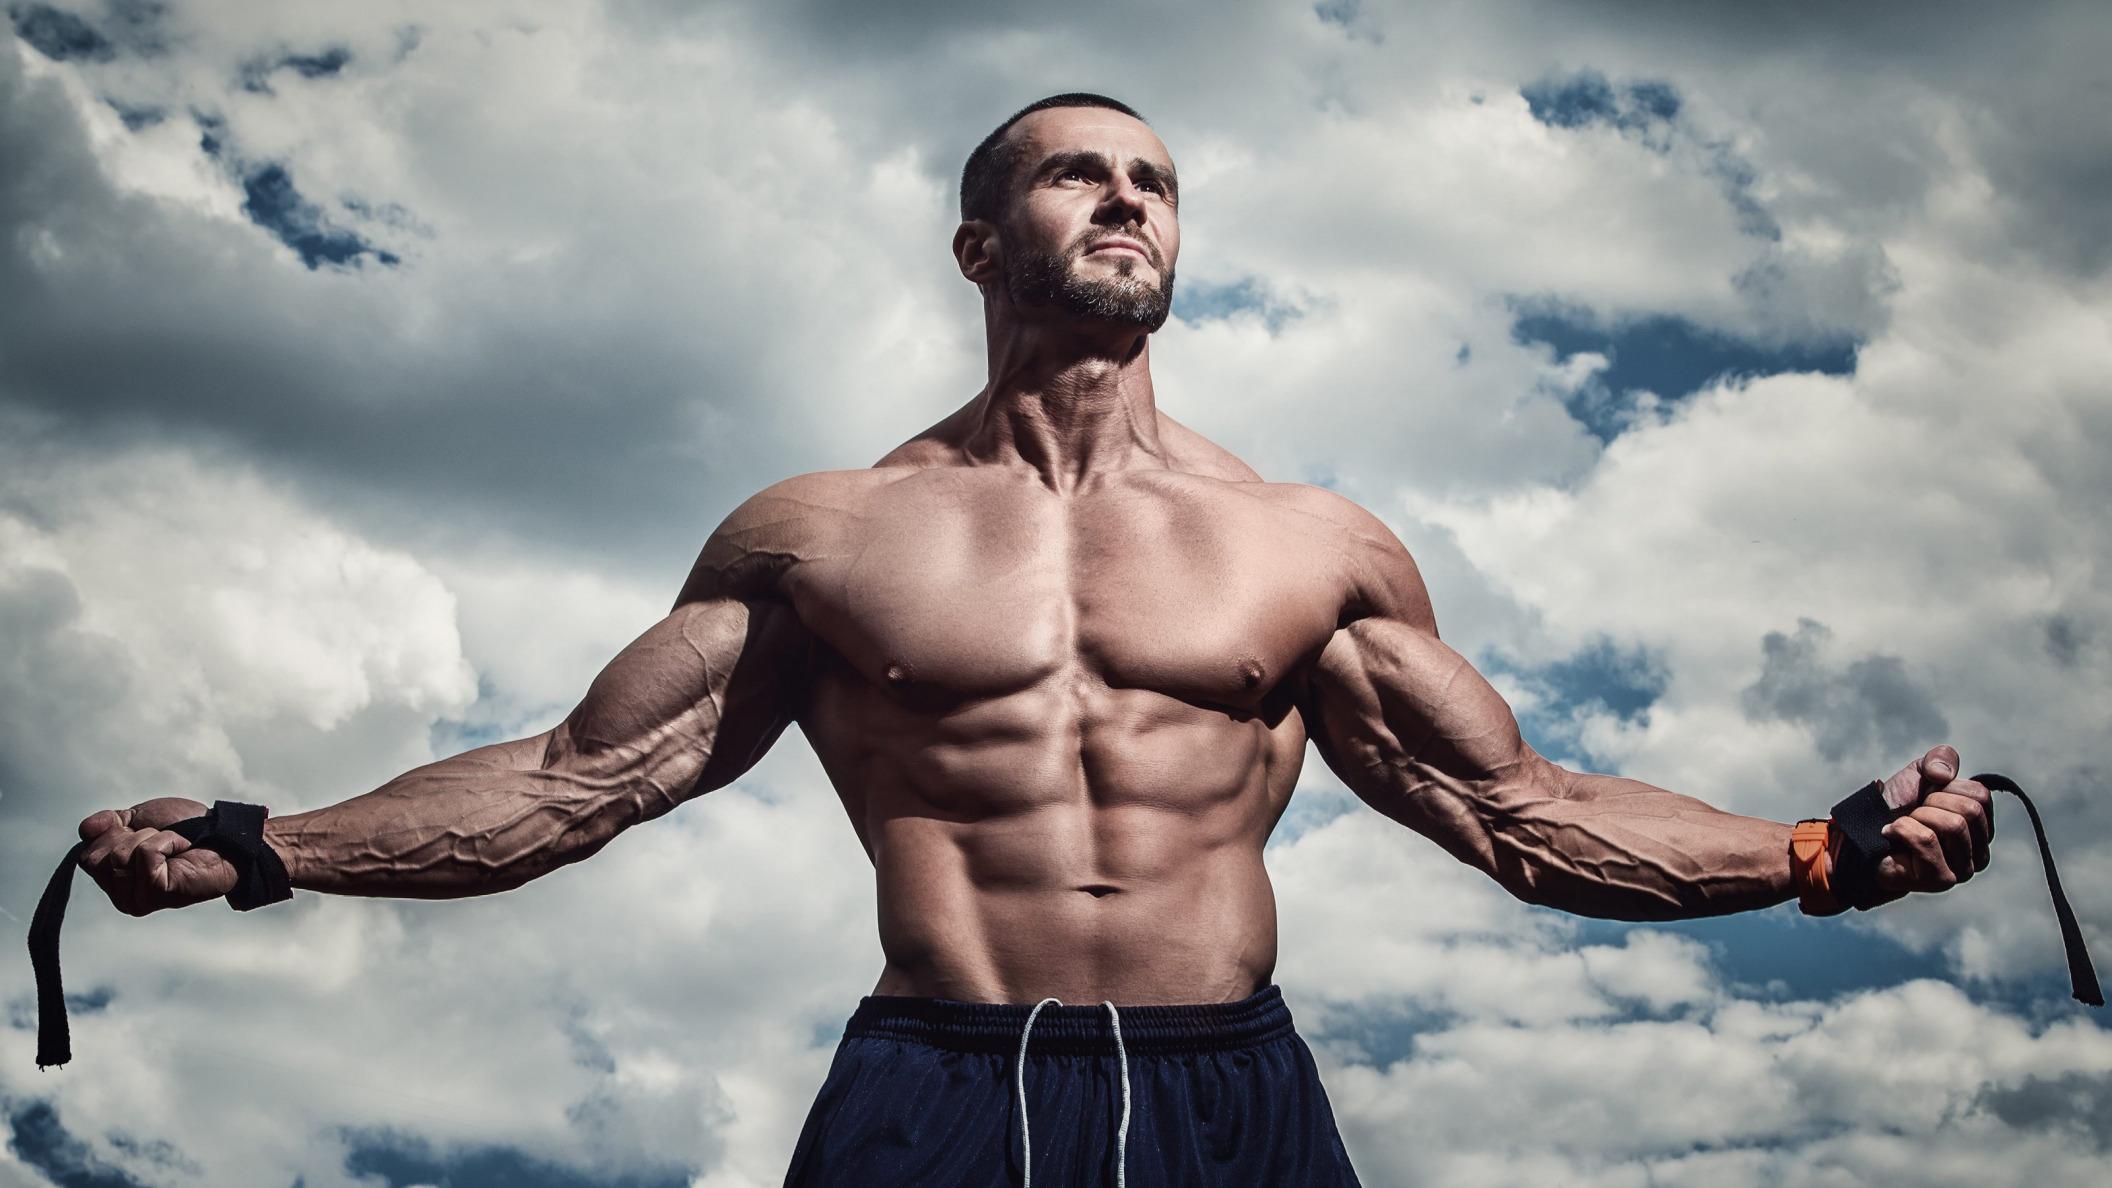 muscle-myshtsy-press-pose-bodibilder-abs-bodybuilder-vzgliad.jpg (2112×1188)